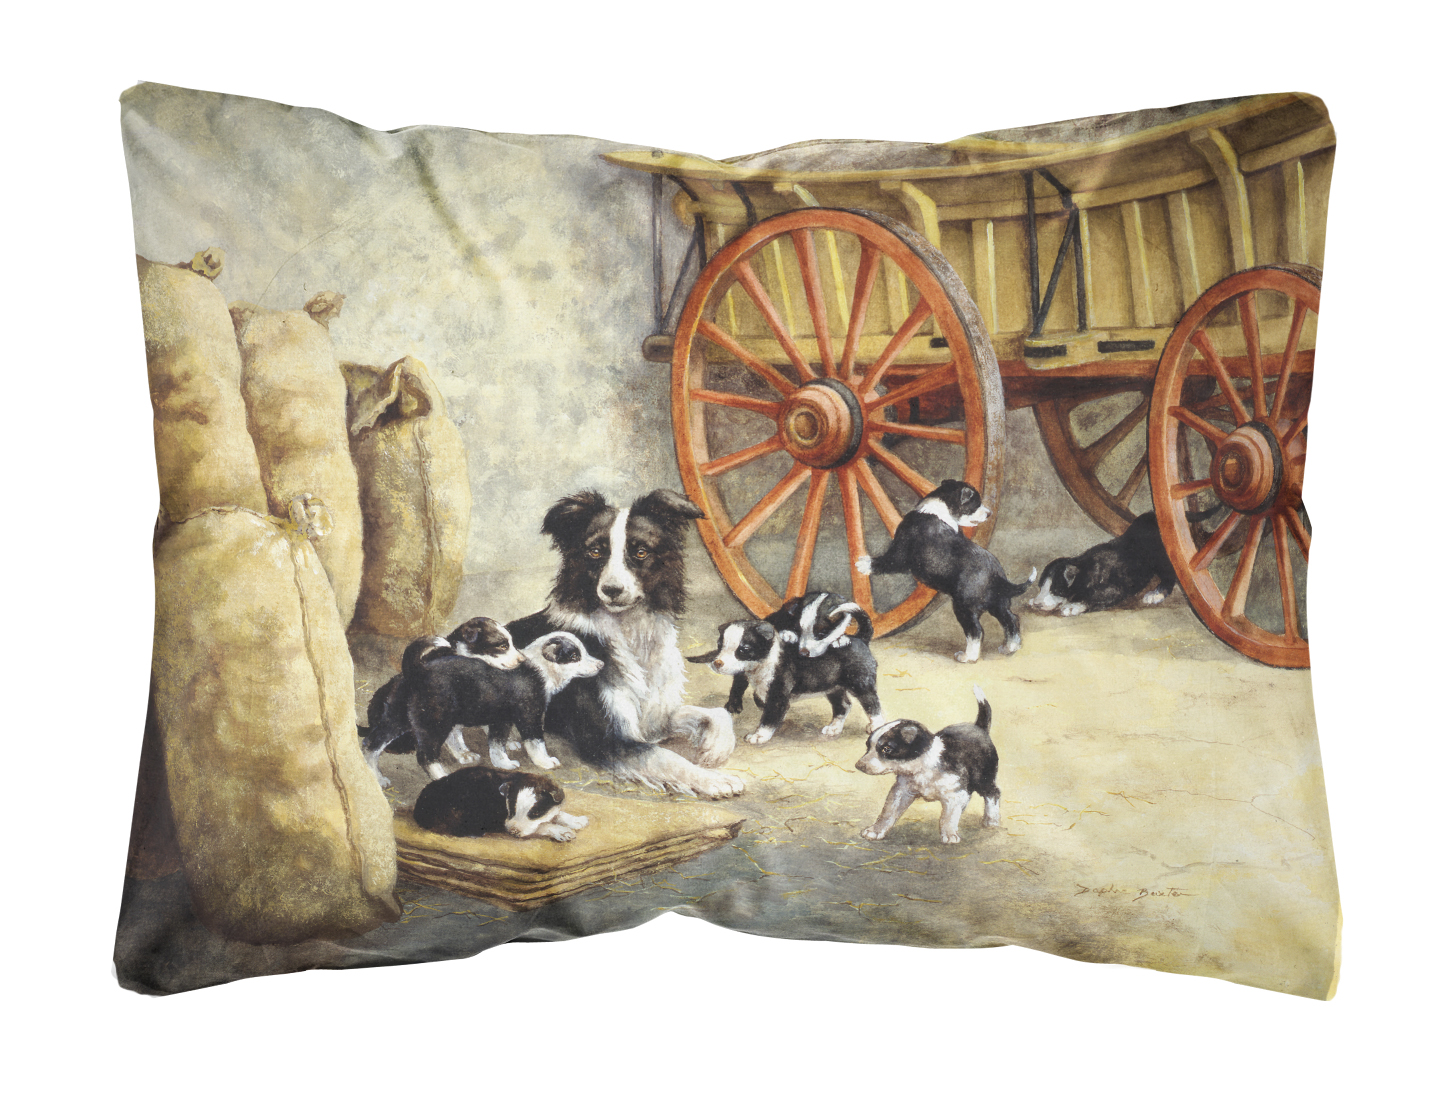 Border Collie Dog Litter Fabric Decorative Pillow Walmart Com Walmart Com